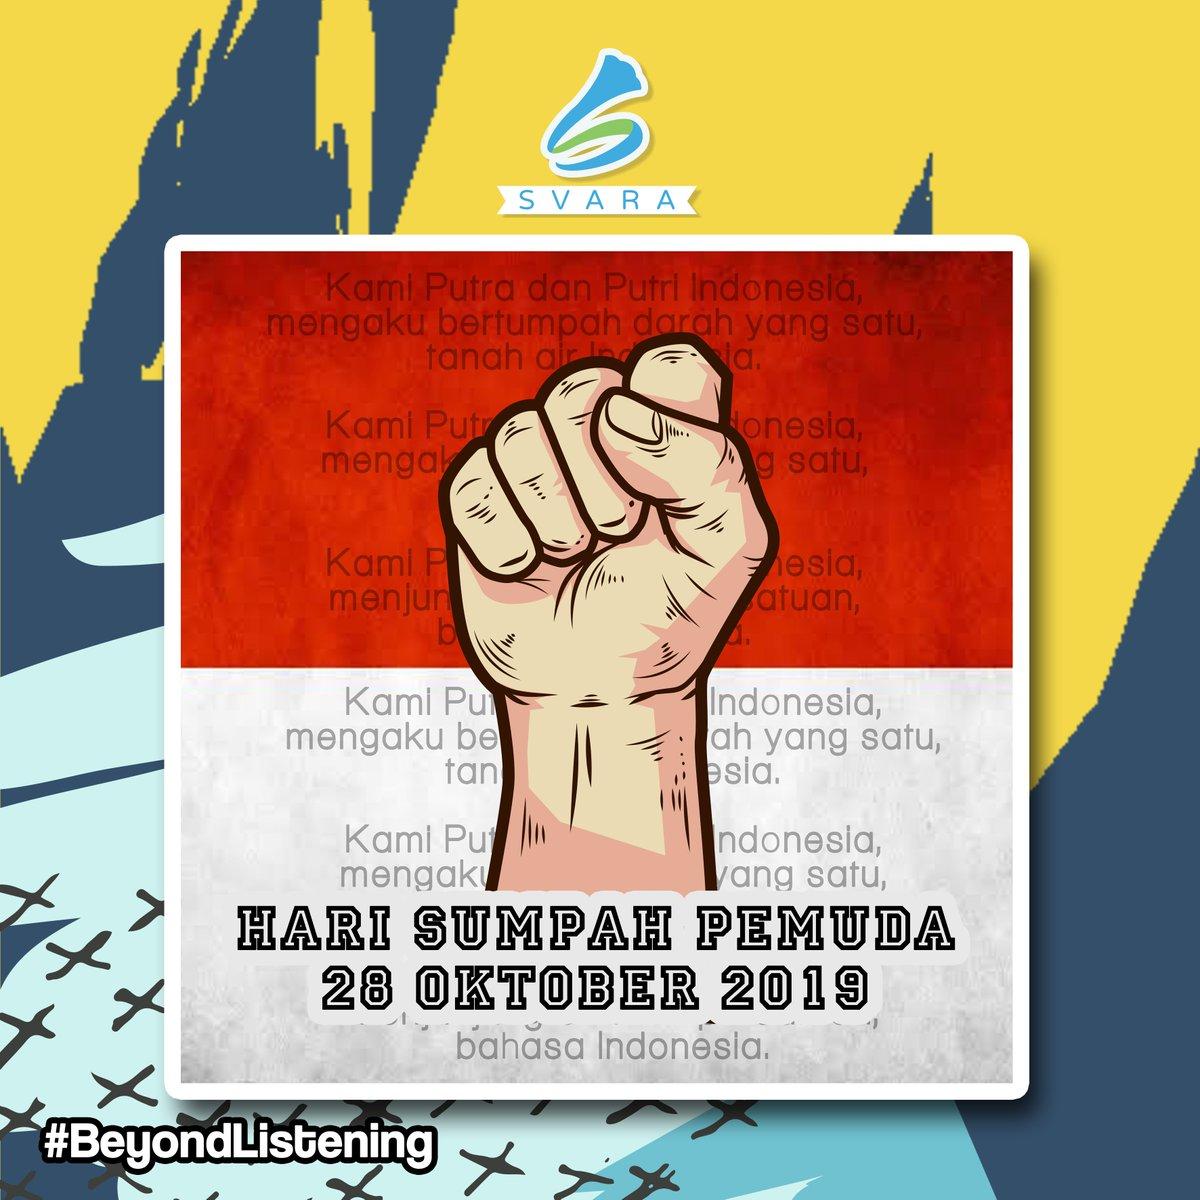 Wahai pemuda bersatulah untuk Tanah Air dan Bangsa ini dan tetap menjunjung tinggi bahasa persatuan Indonesia. Selamat Hari Sumpah Pemuda.  . . . #beyondlistening pic.twitter.com/Vr4vQvyj57